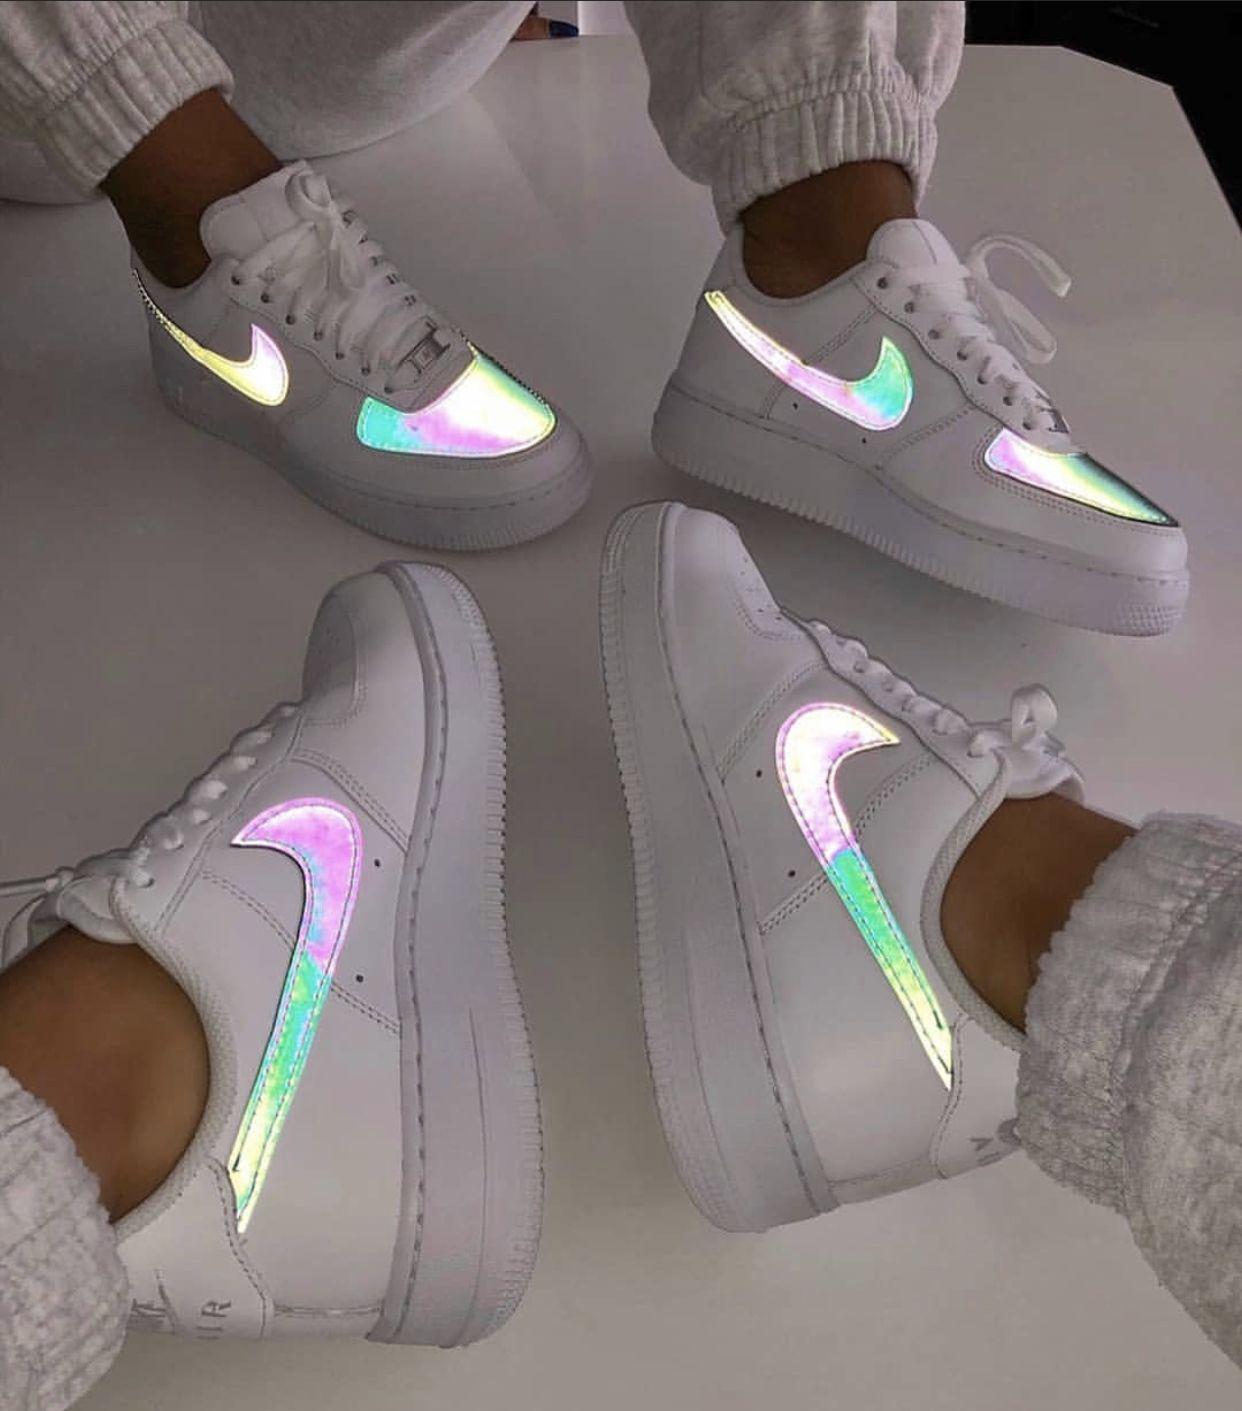 Nike Air Force 1 Reflective, 2020 Nike ayakkabılar